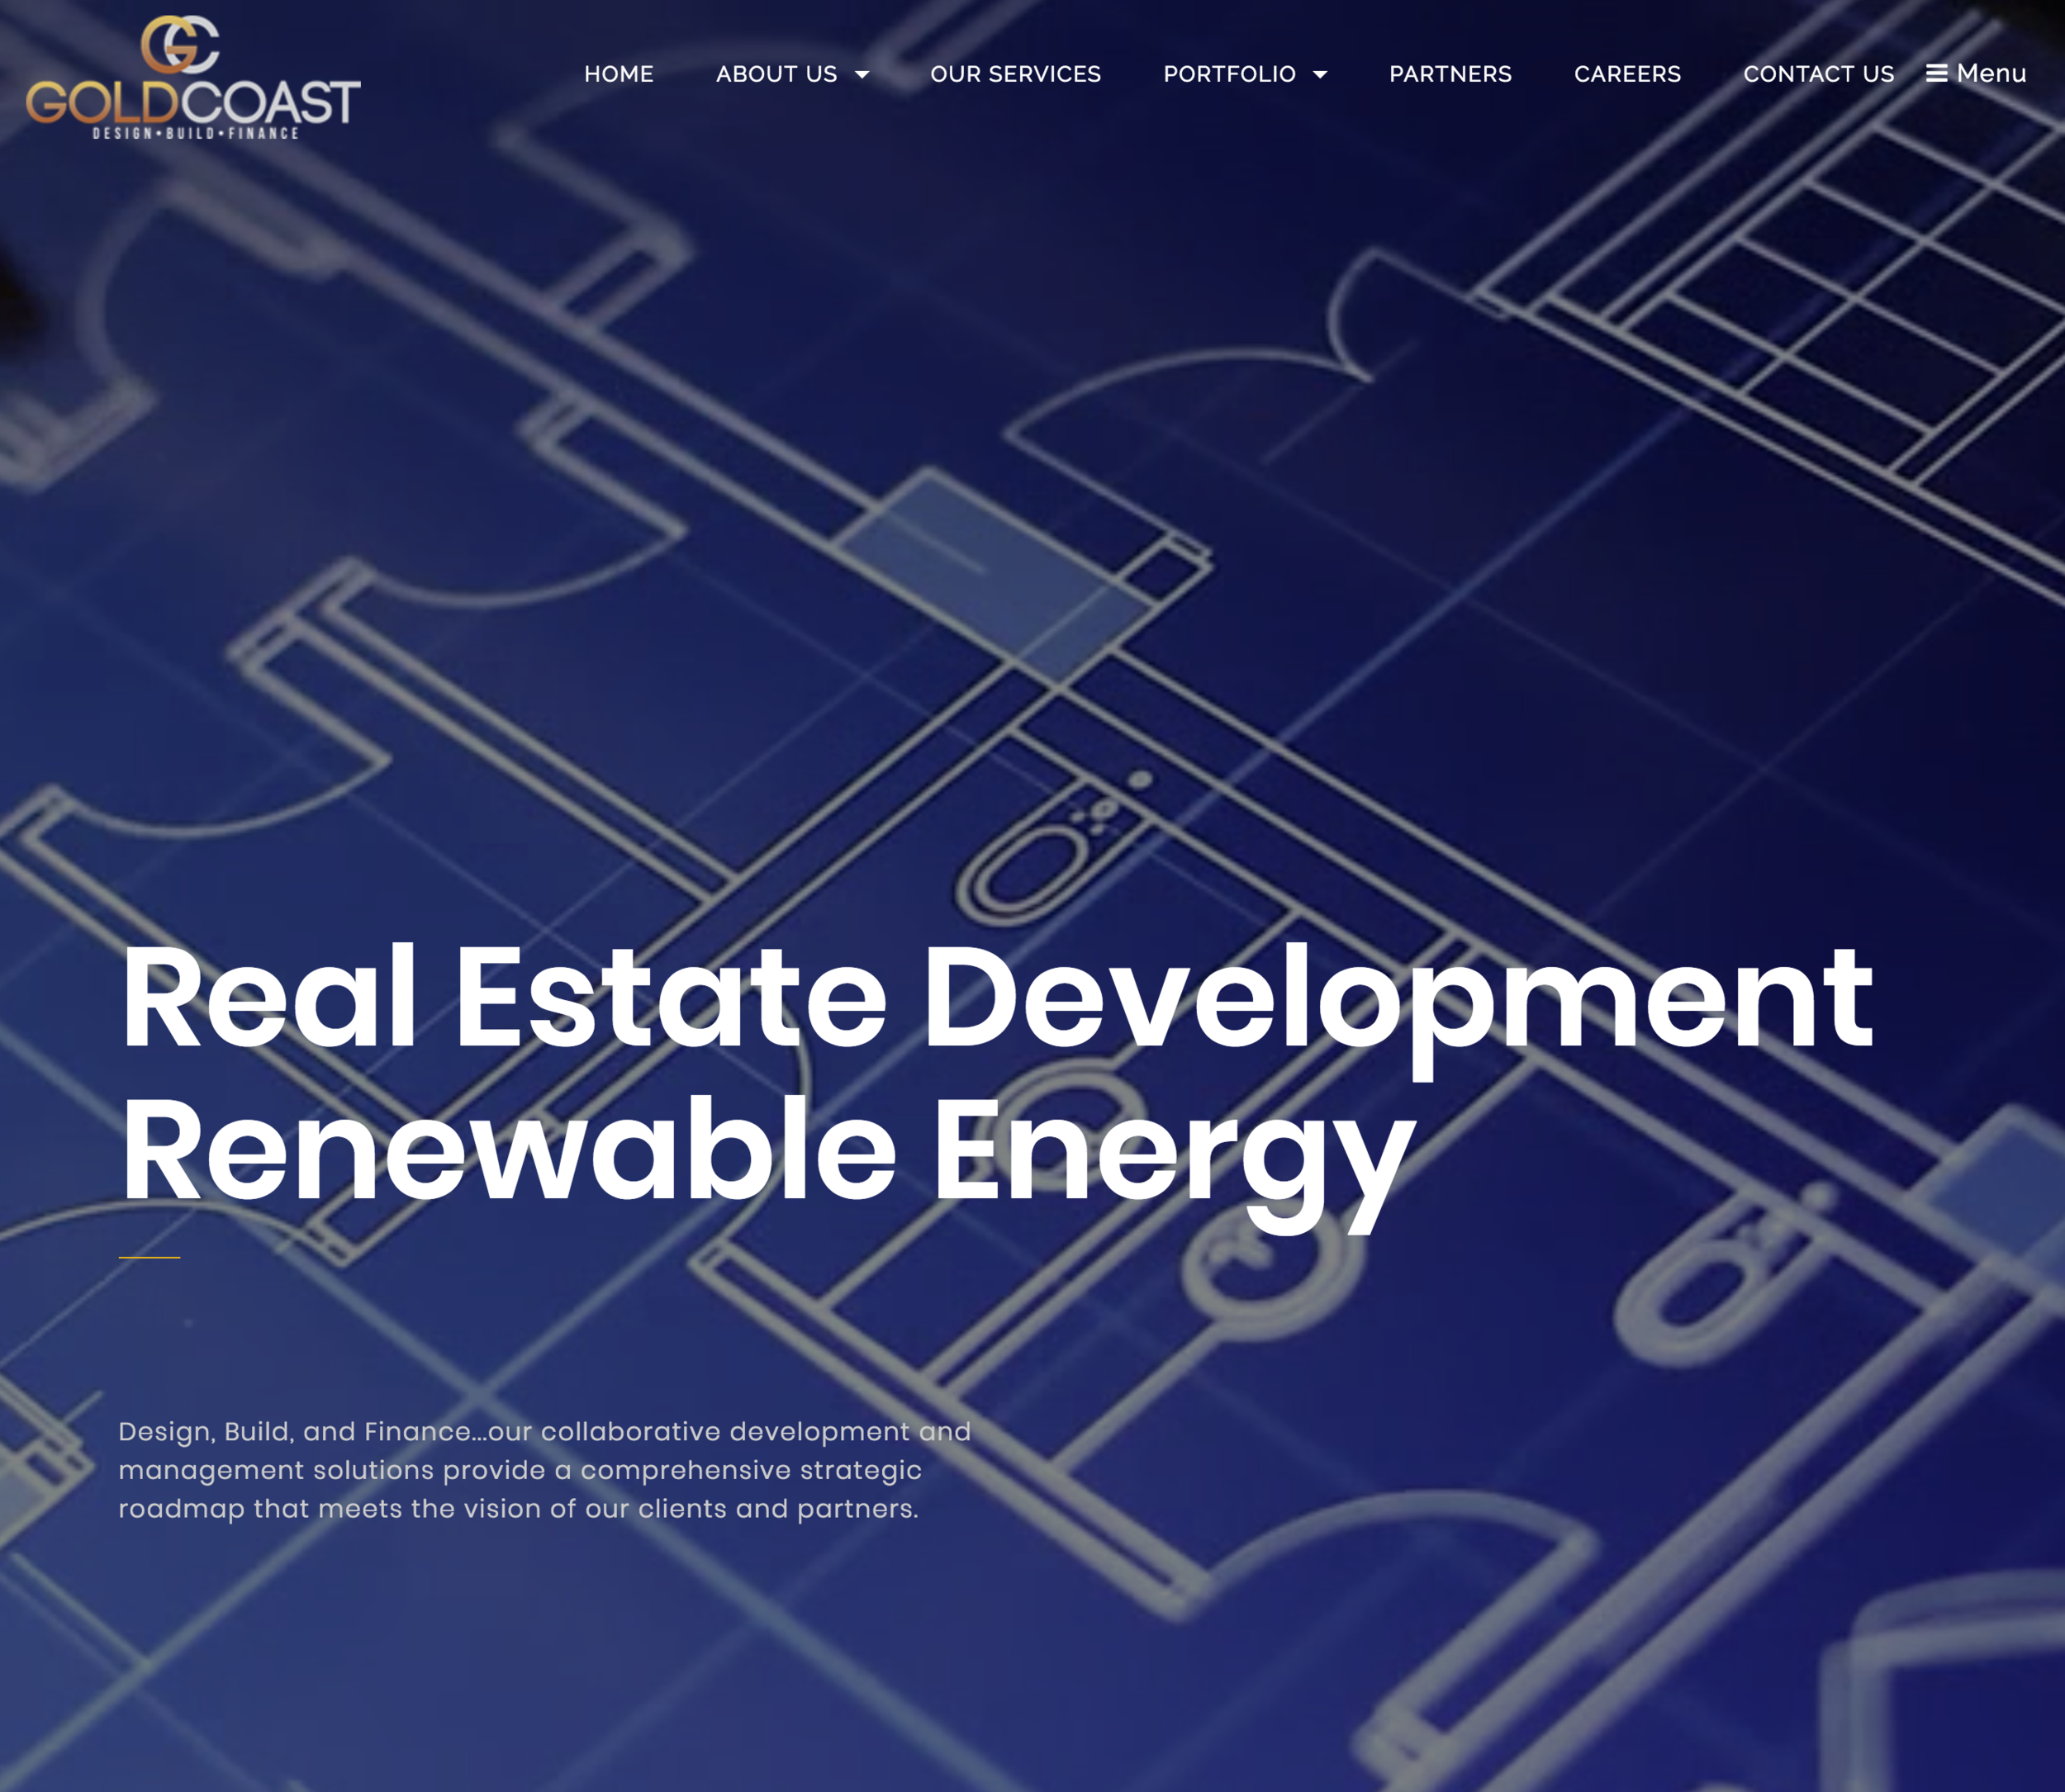 Gold Coast Partners